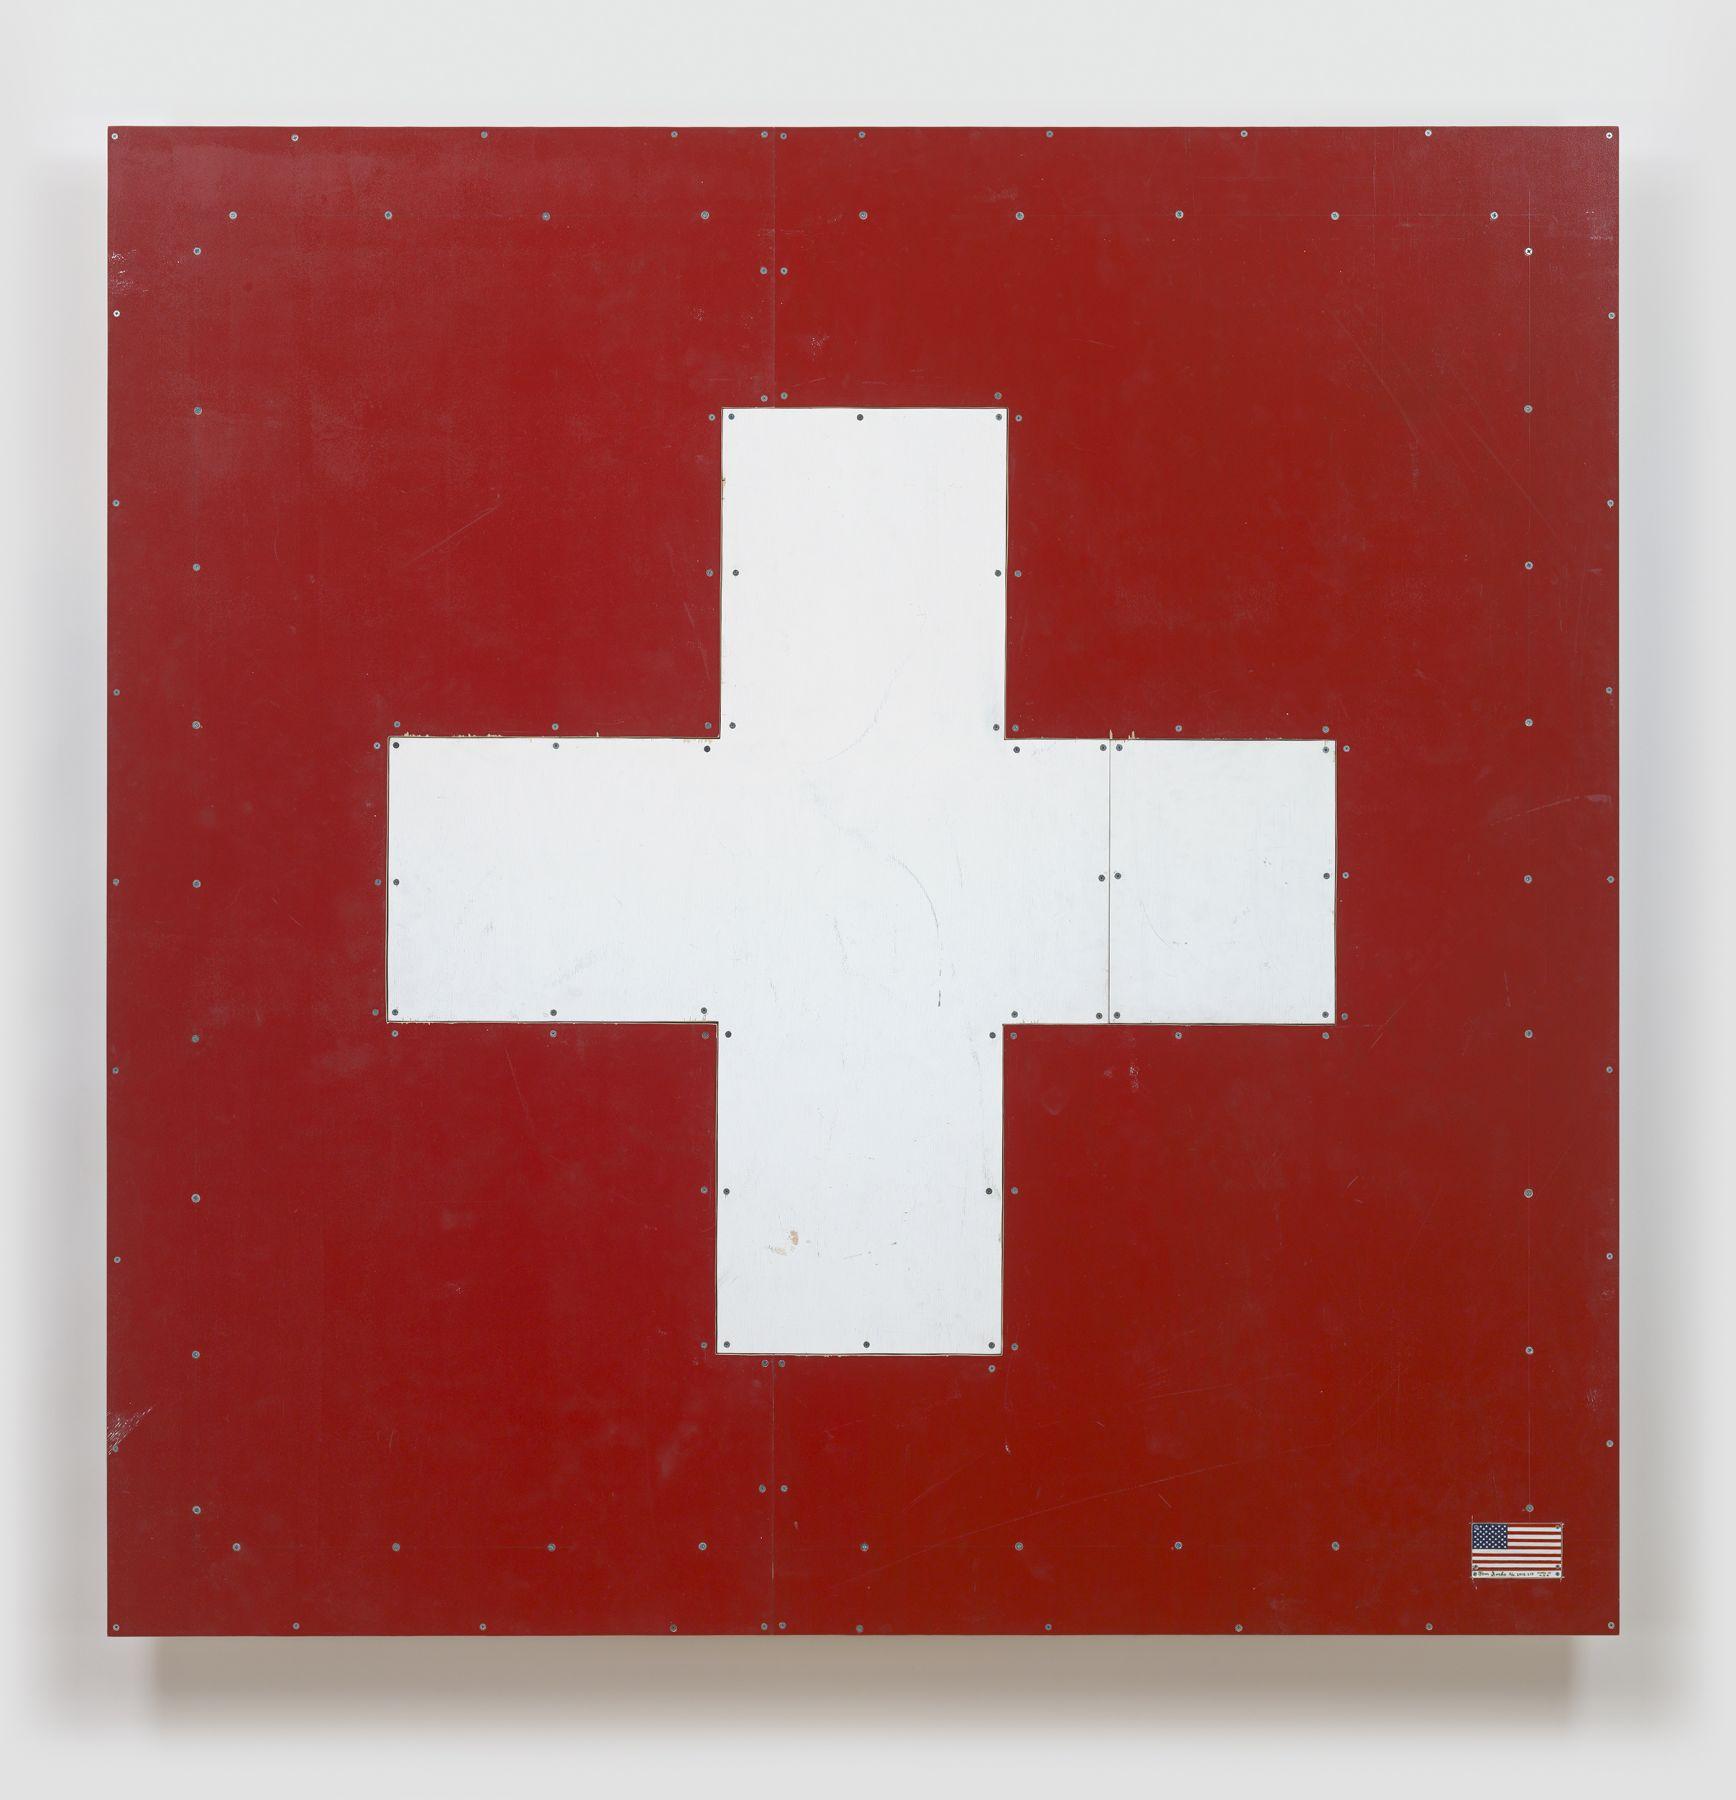 Tom Sachs, Swiss Flag, 2018